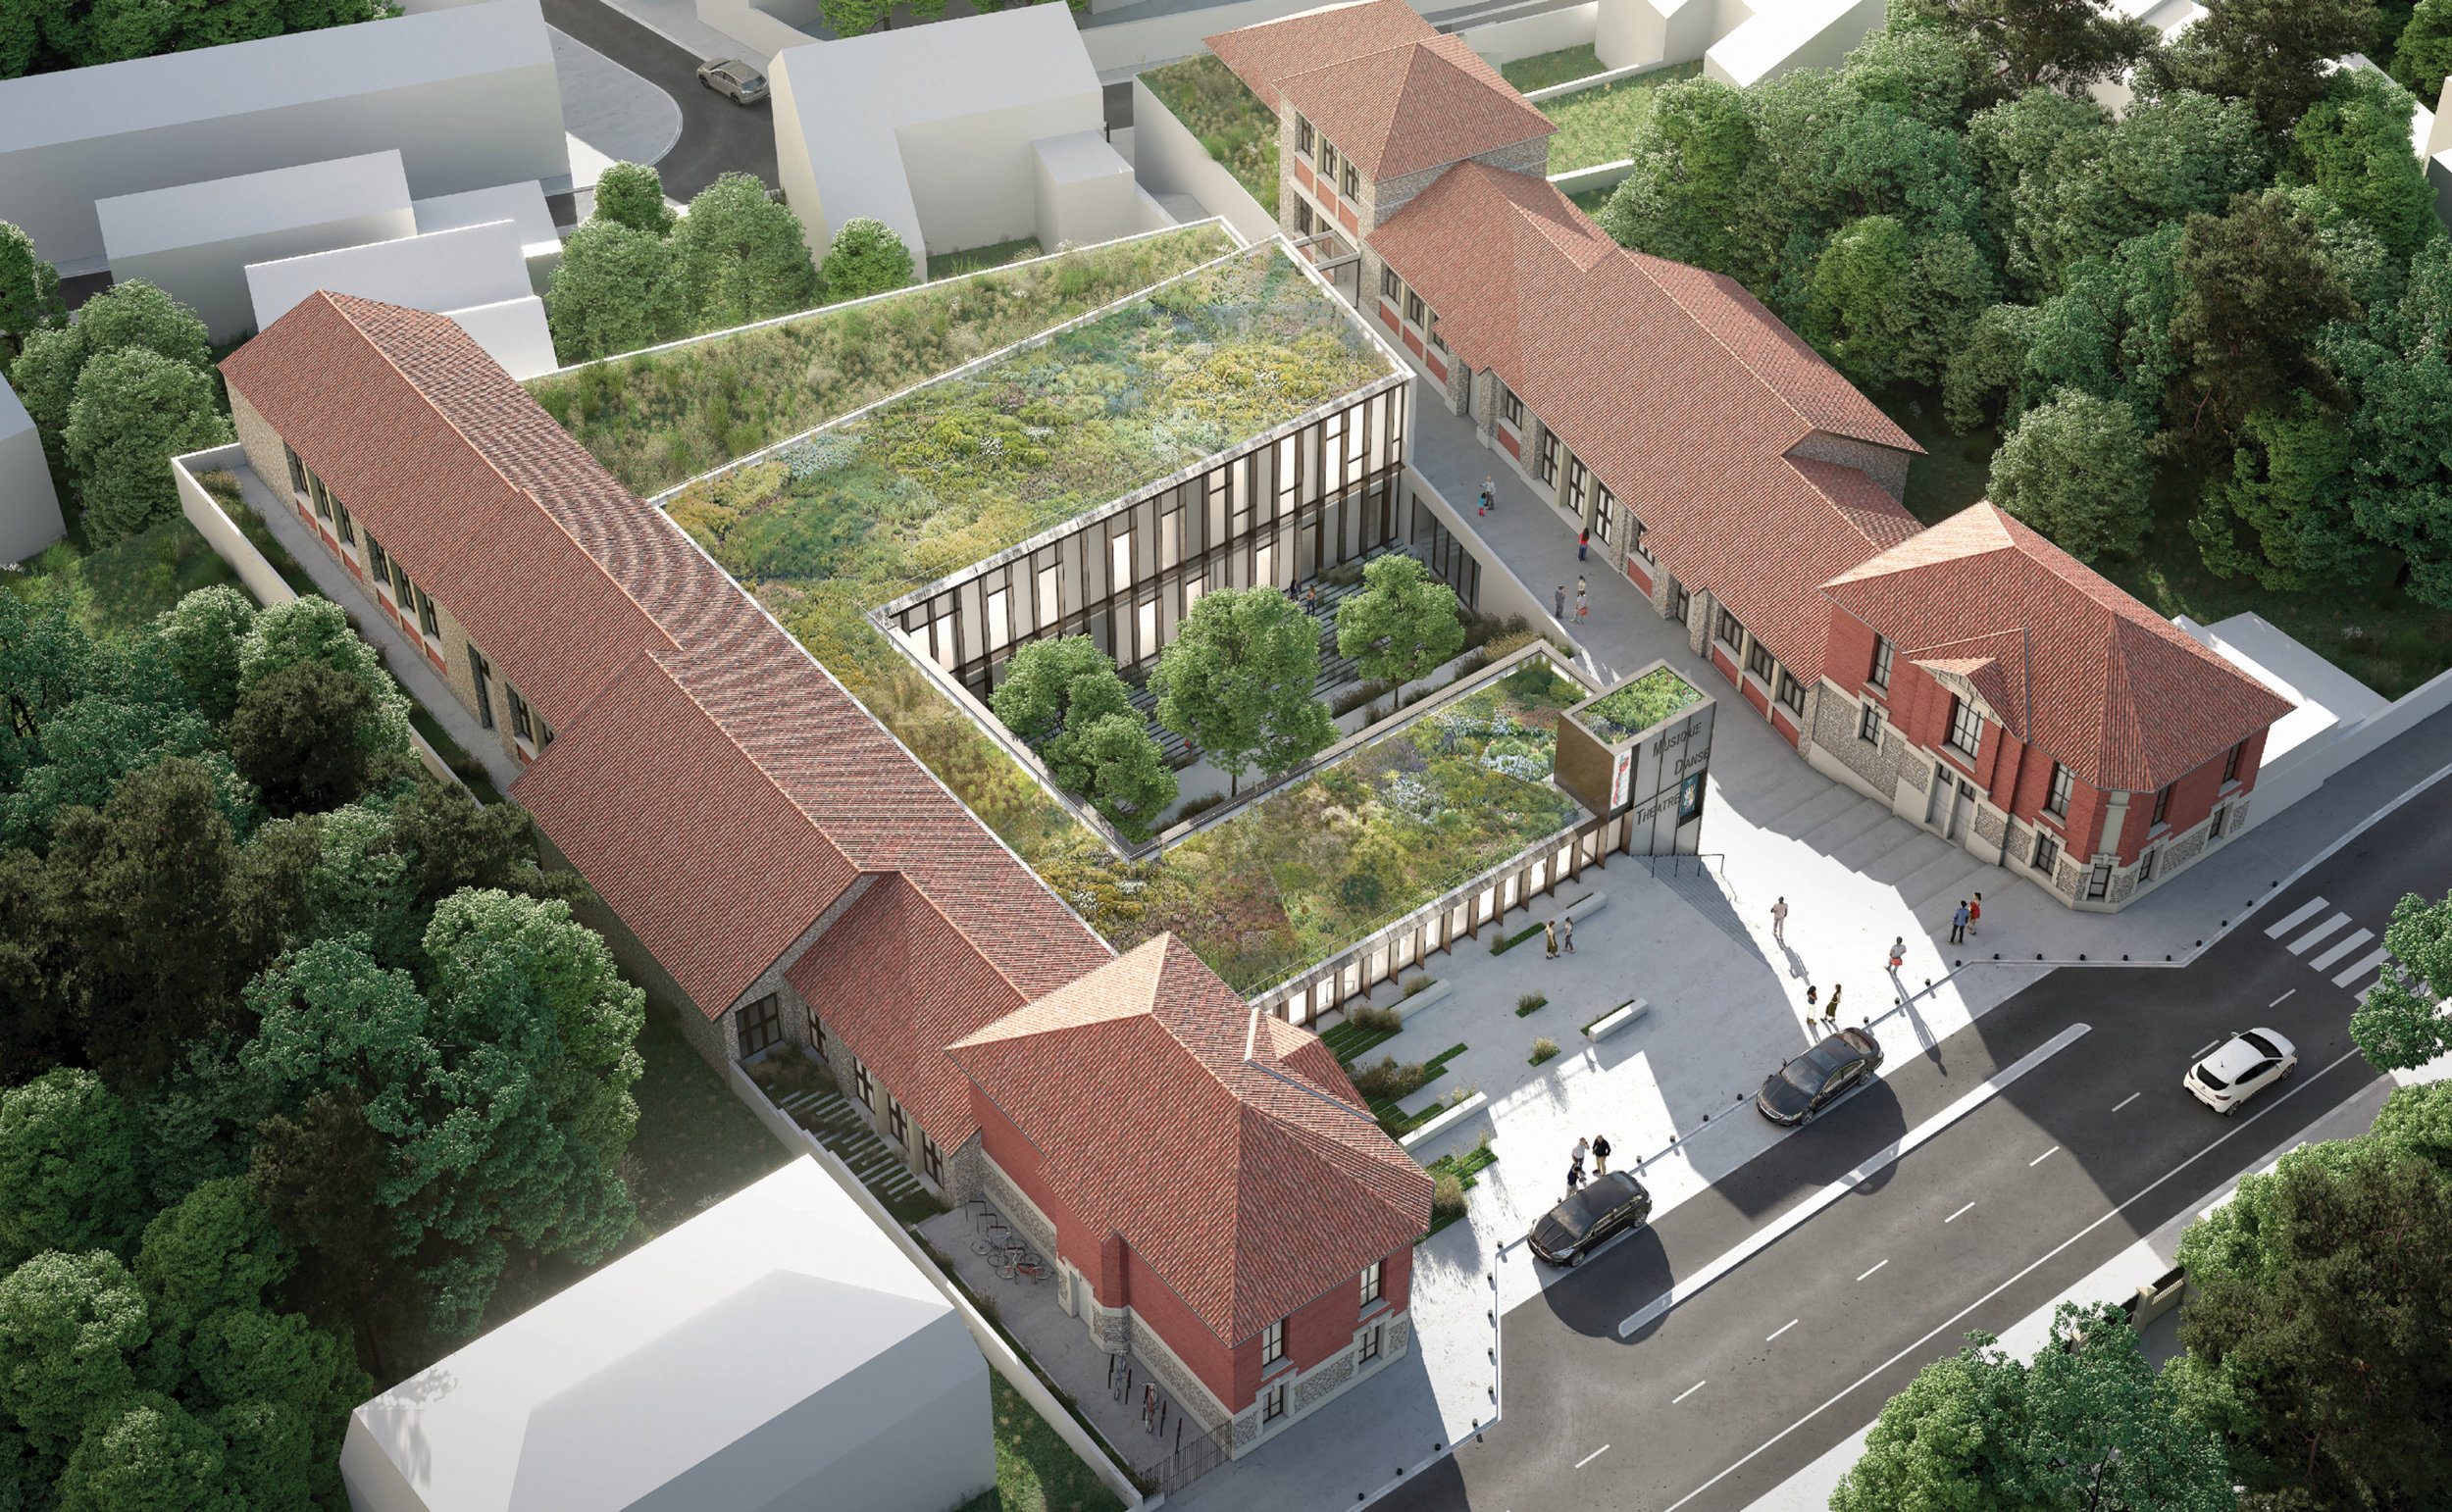 conservatoire_palaiseau_public_outdoor_design_christophe_gautrand_paysagiste_2.jpg